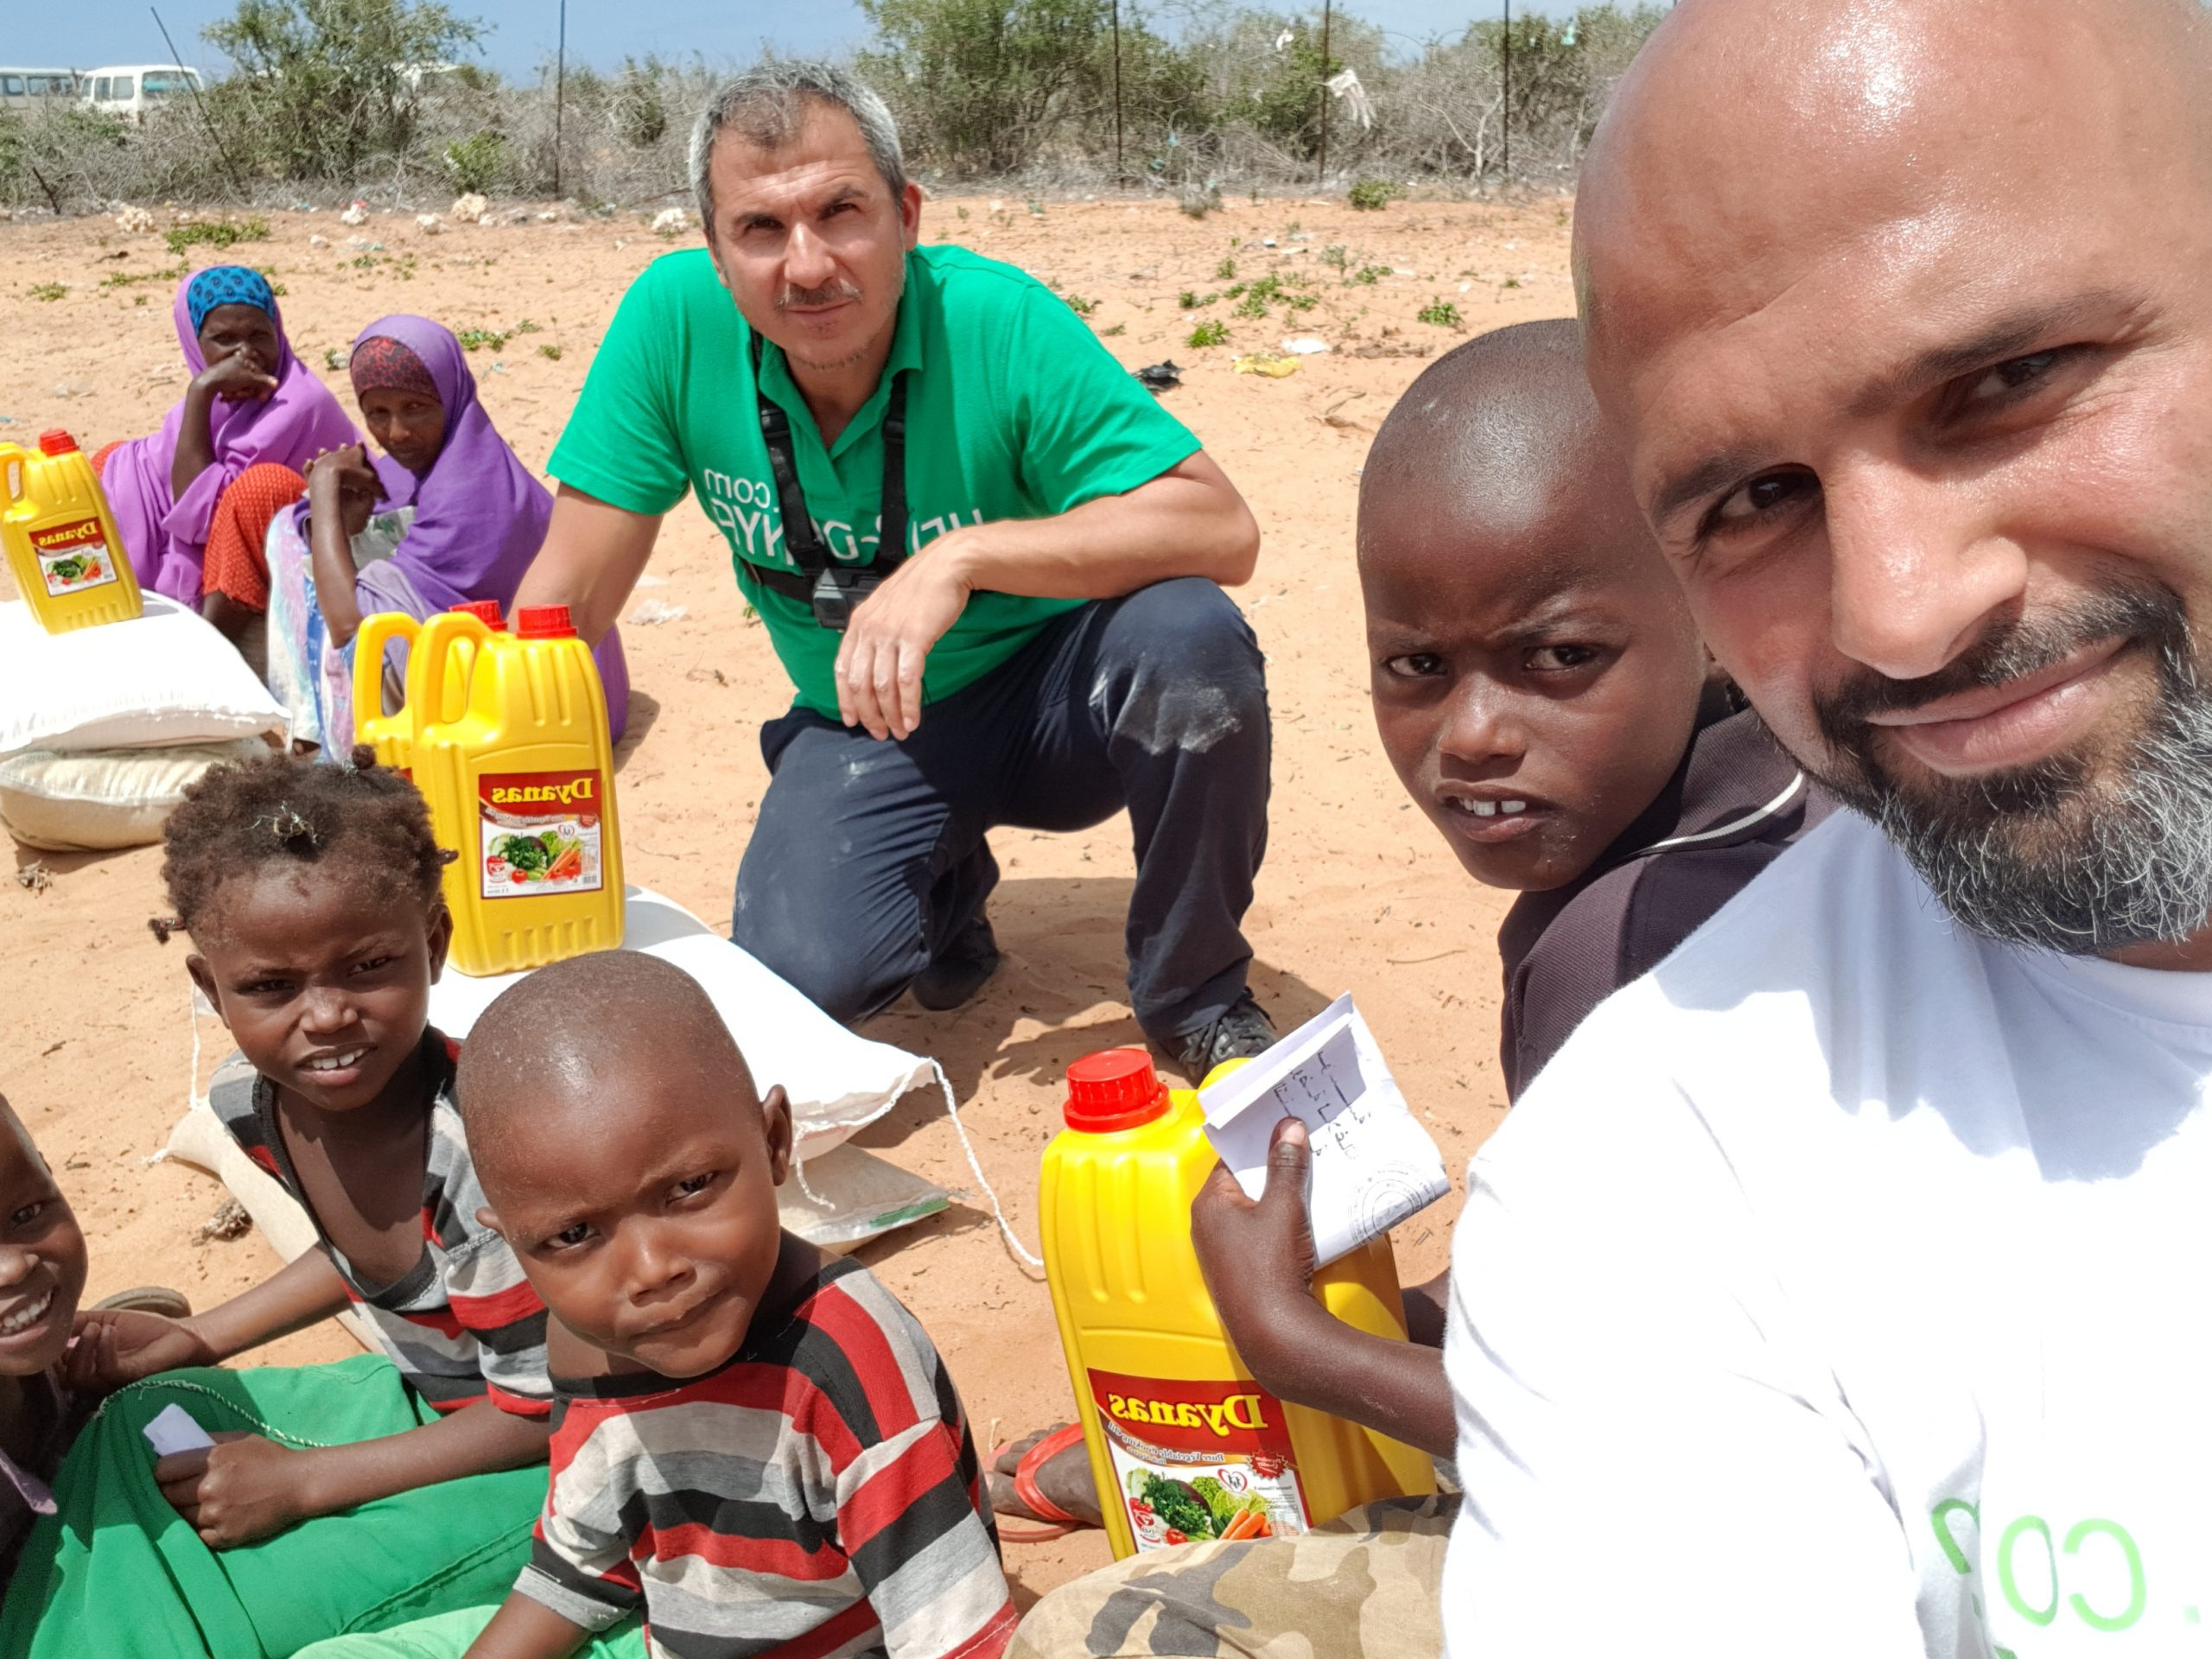 Help Dunya Religiöse Projekt